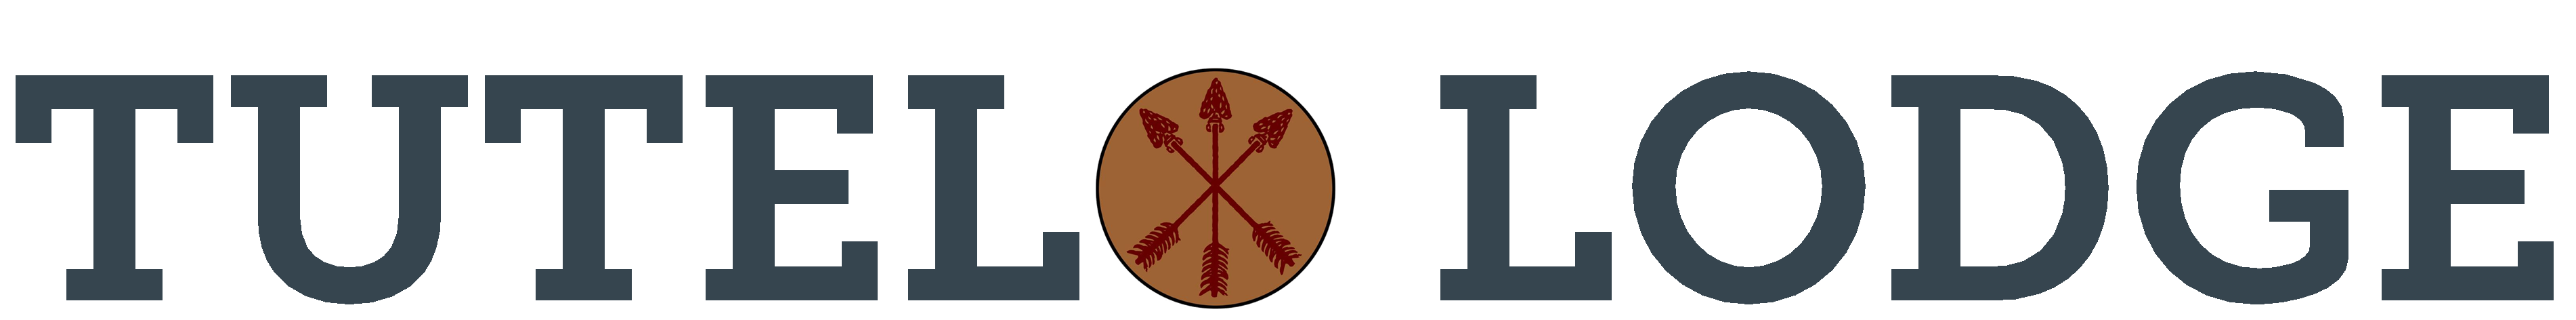 Tutelo Lodge 161, Order of the Arrow